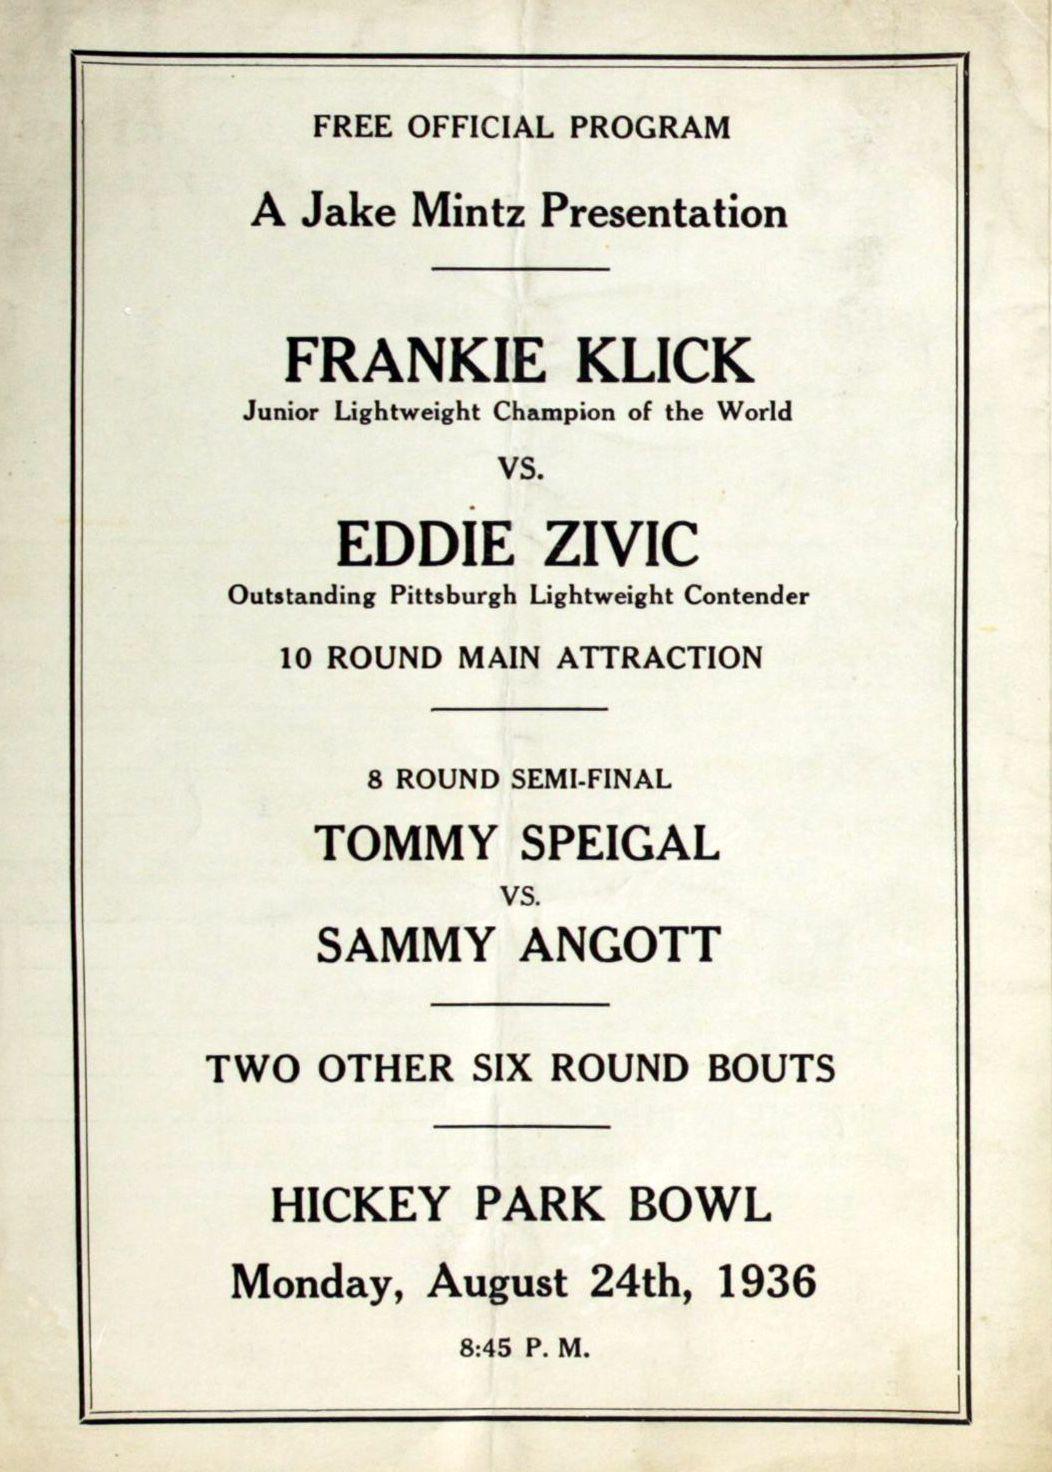 Fight Program 1936